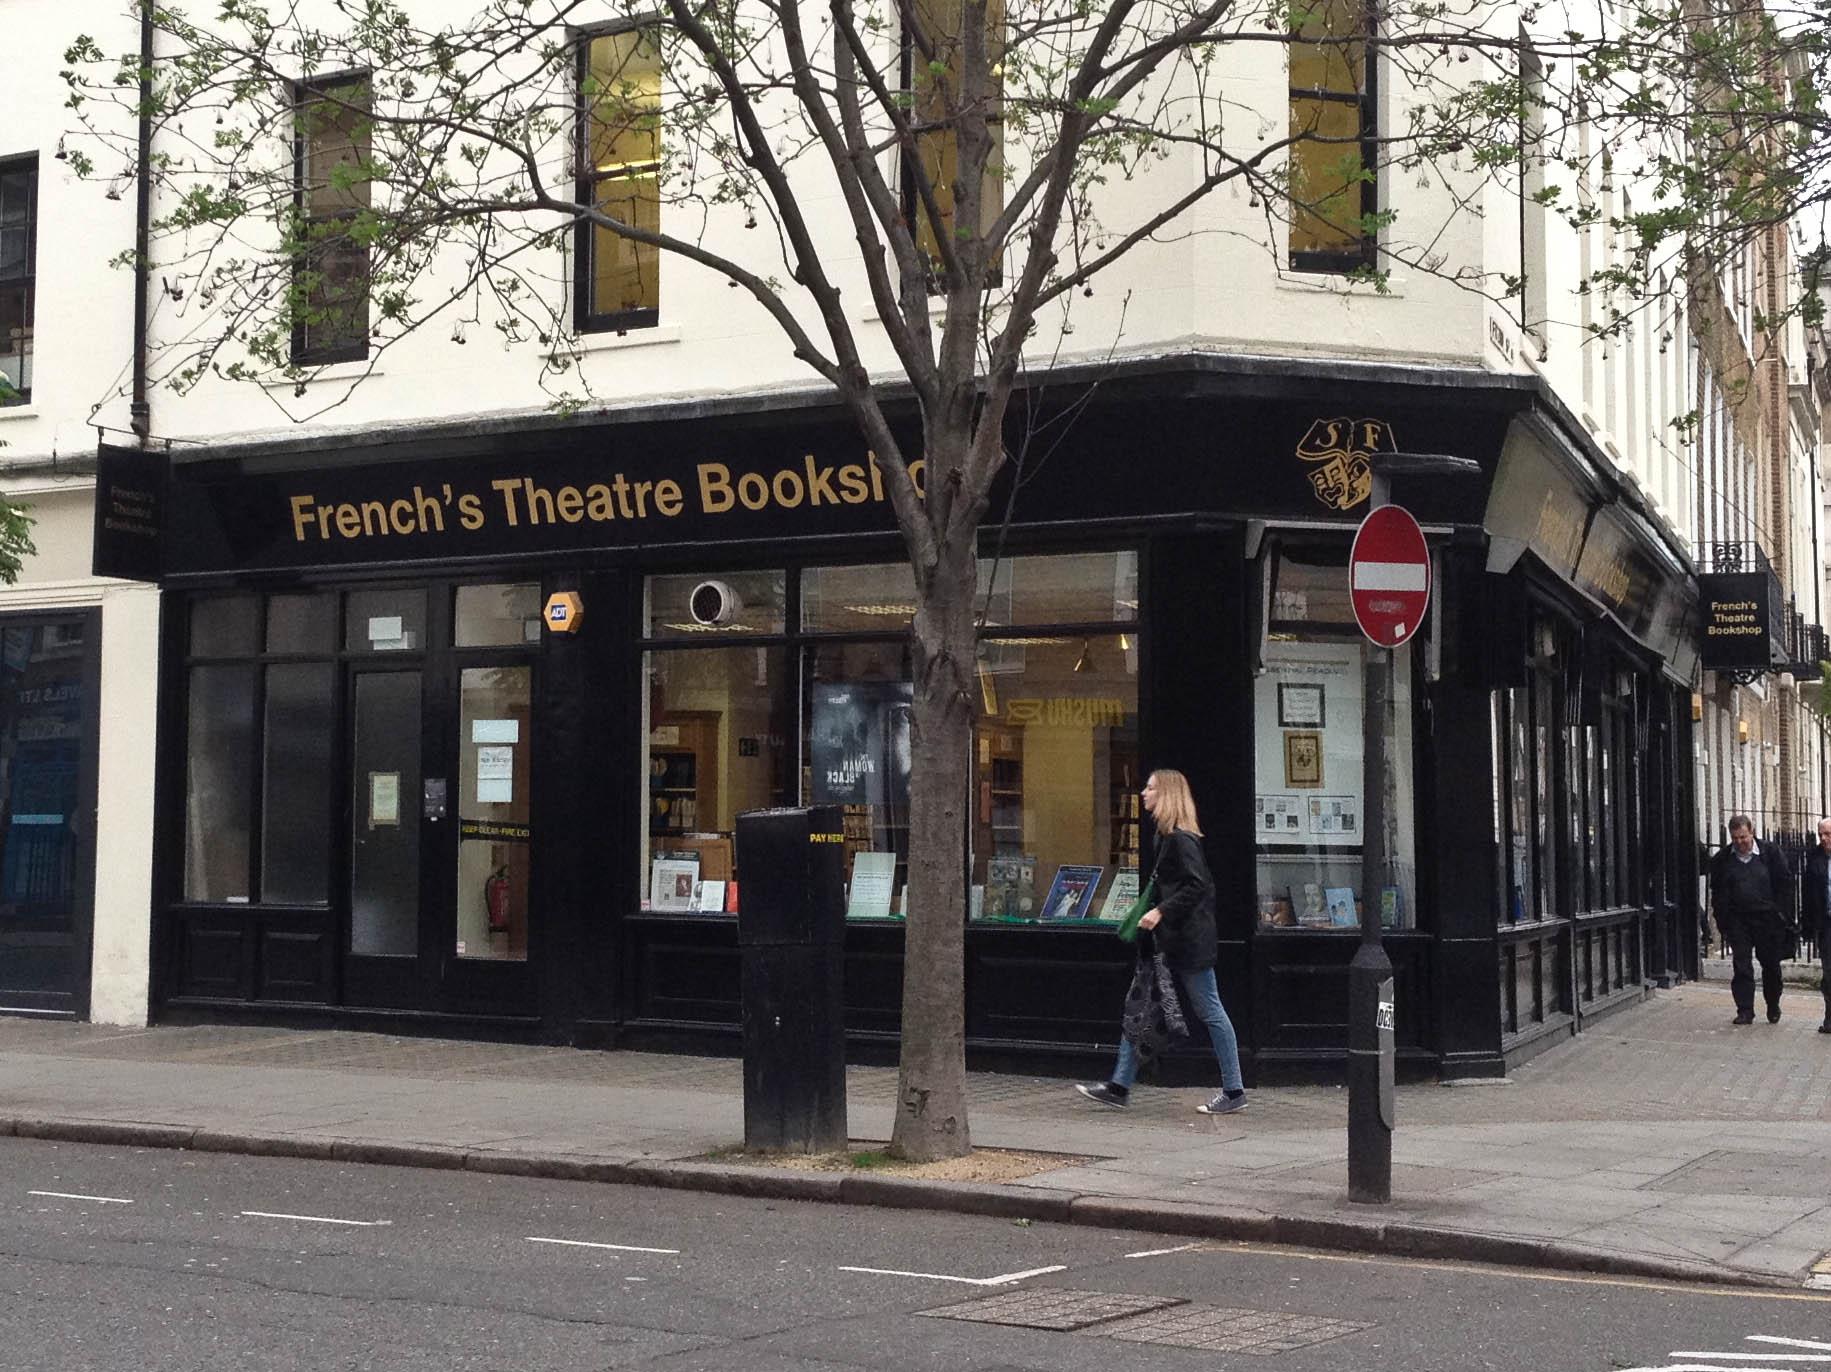 French's_Theatre_Bookshop.jpg